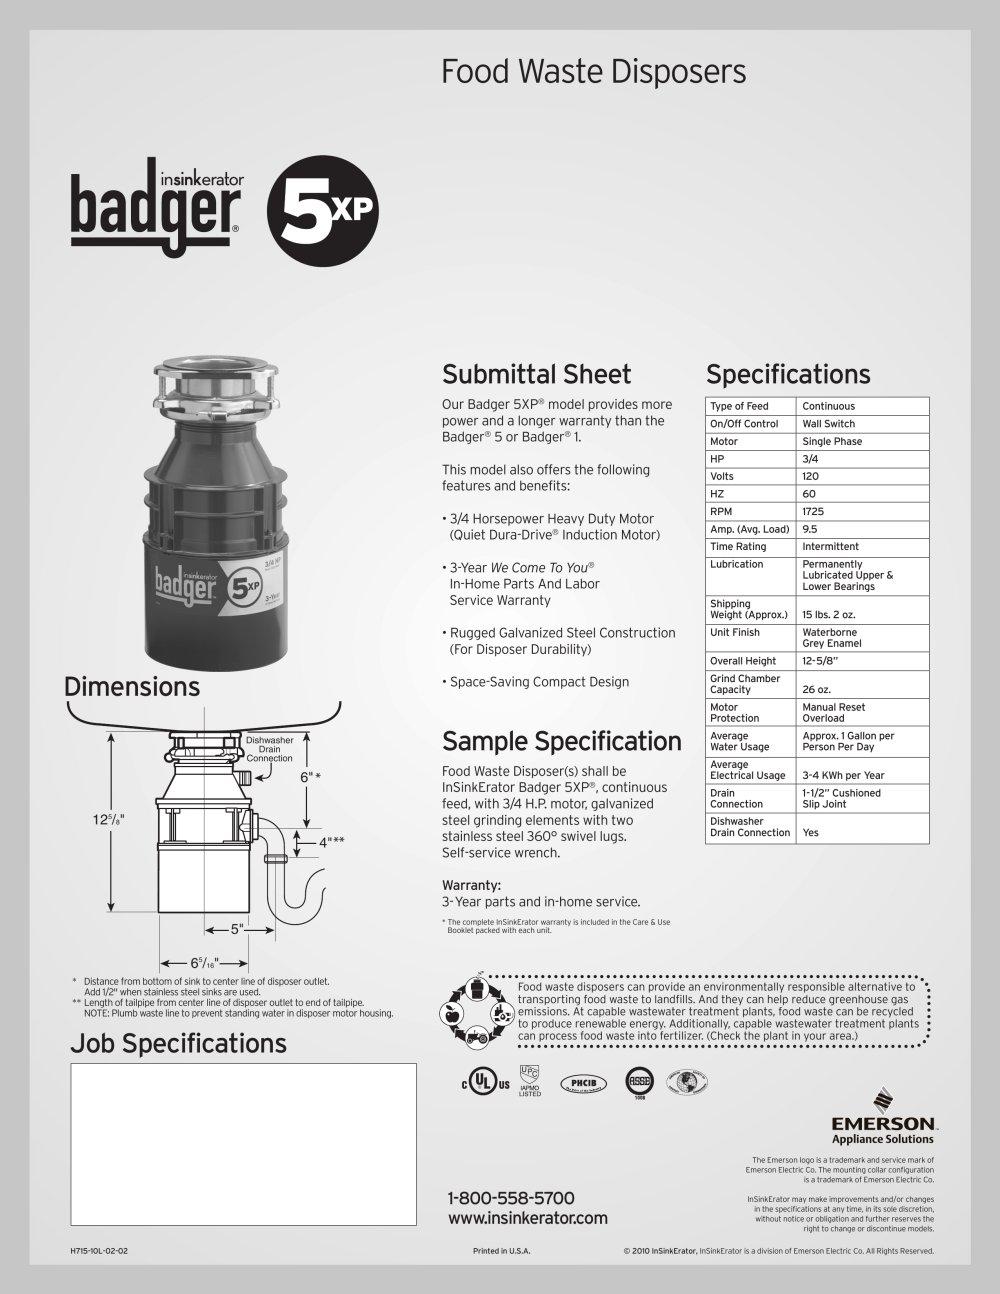 badger 5xp 1 1 pages - Badger 5 Disposal